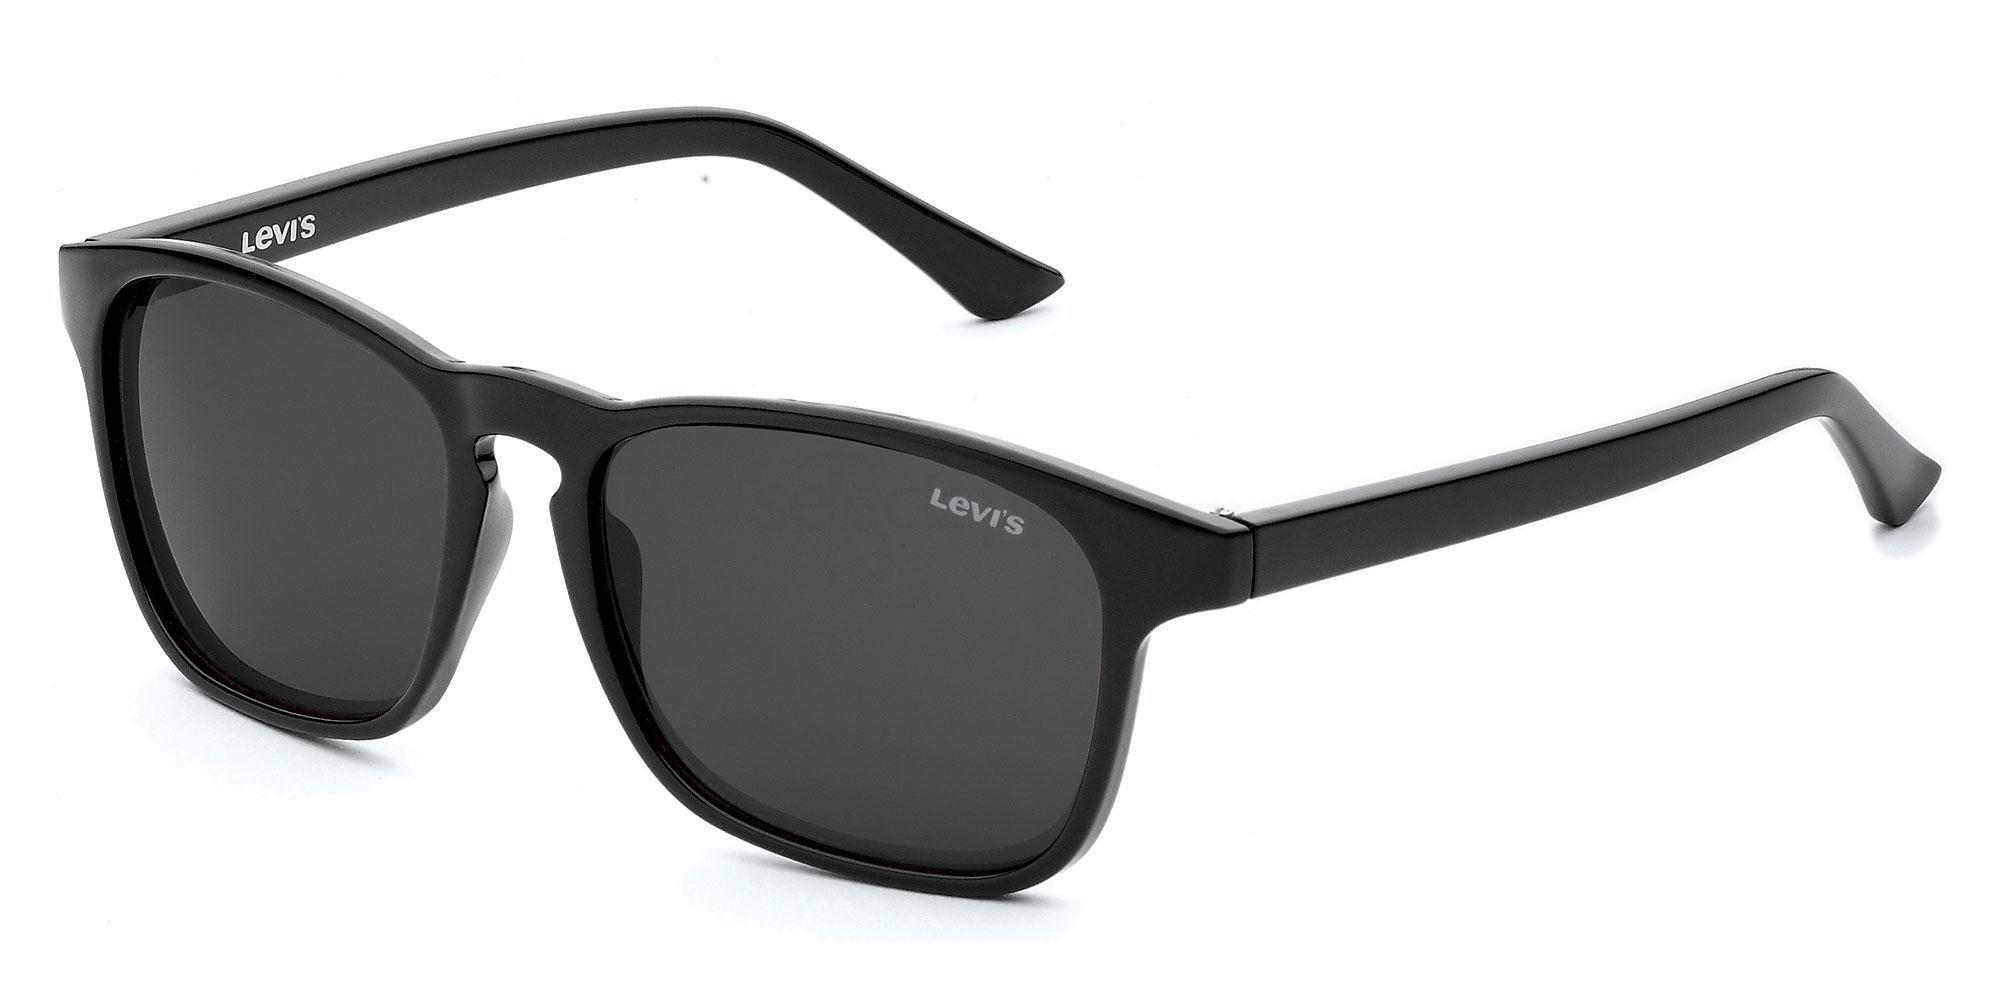 LO22161/01 LO22161 Sunglasses, Levi's Eyewear